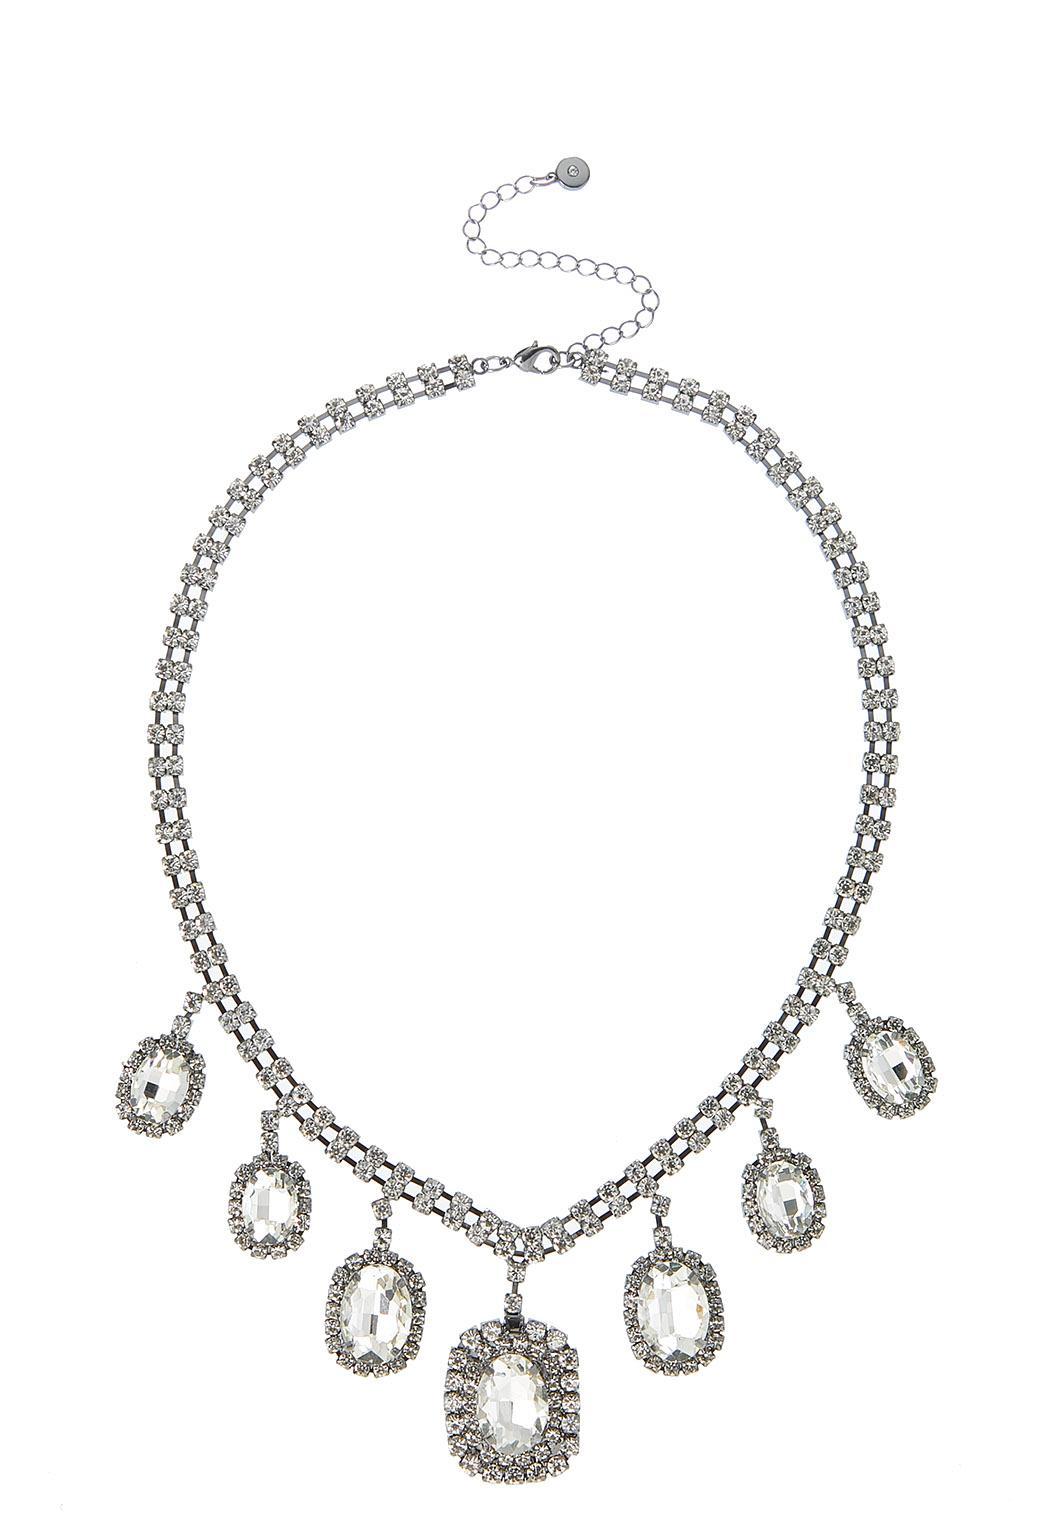 Cupchain Rhinestone Bib Necklace